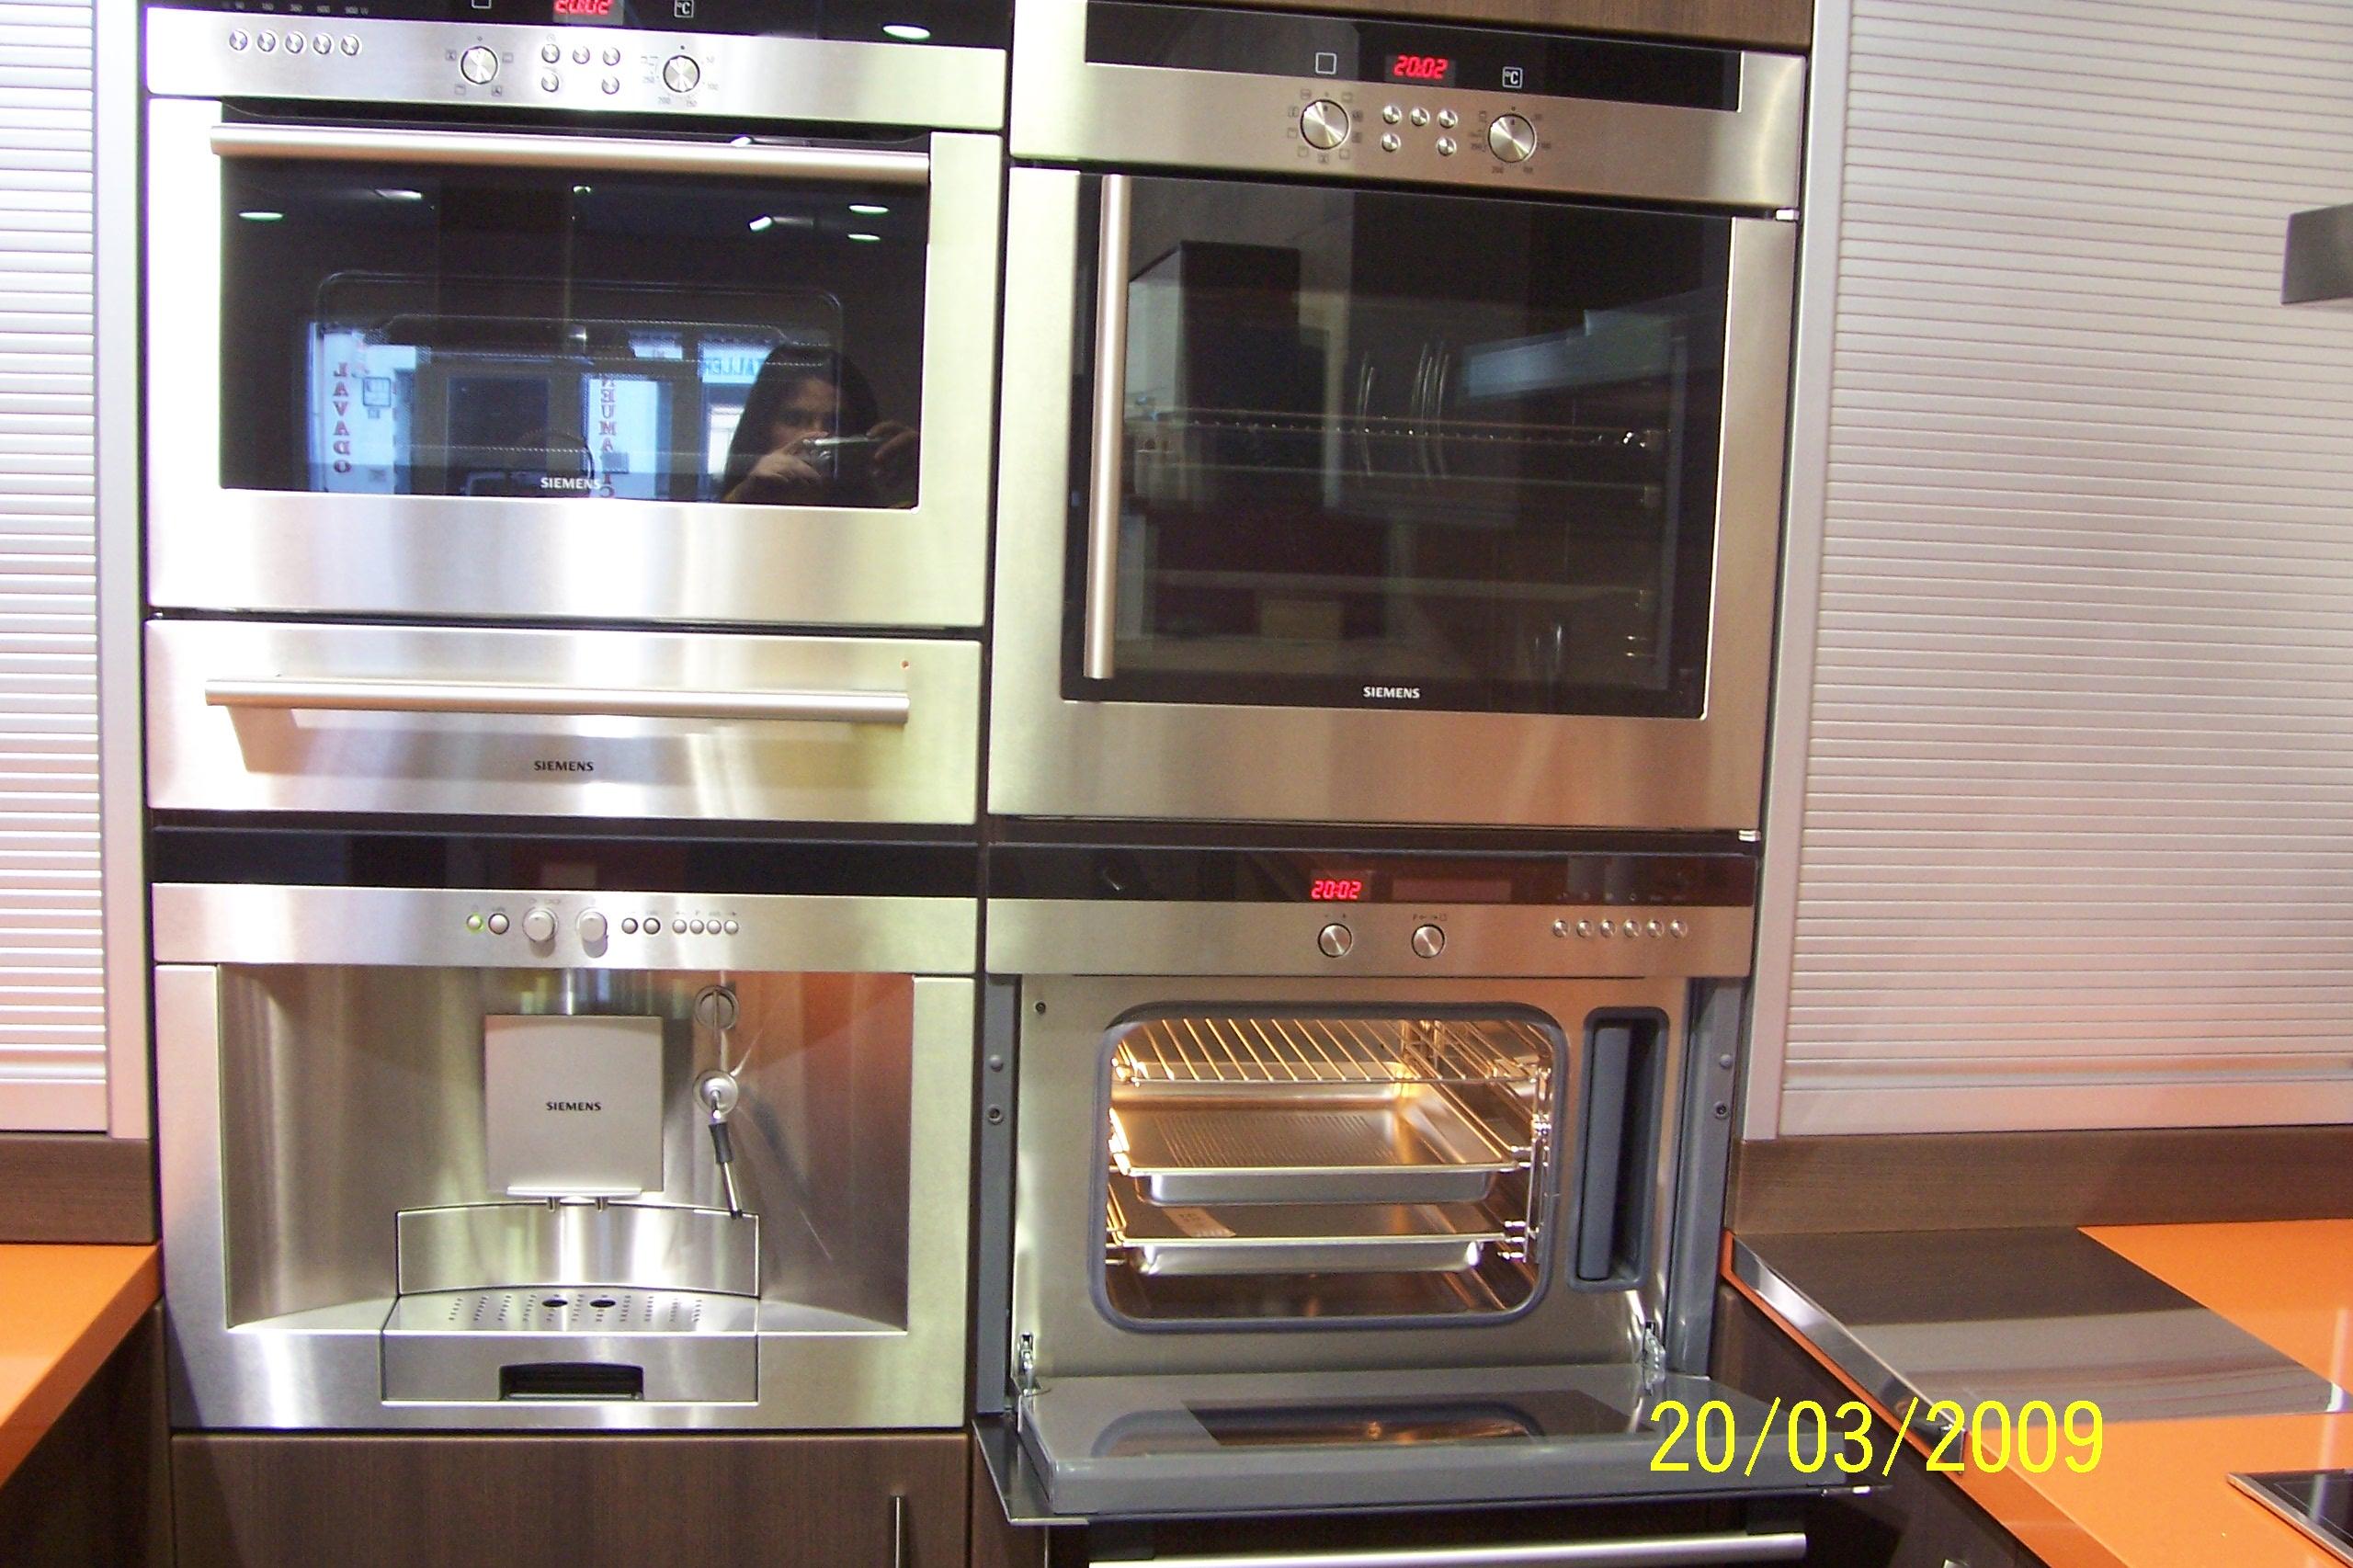 Columna horno y microondas con grill with columna horno y - Columna horno y microondas ...